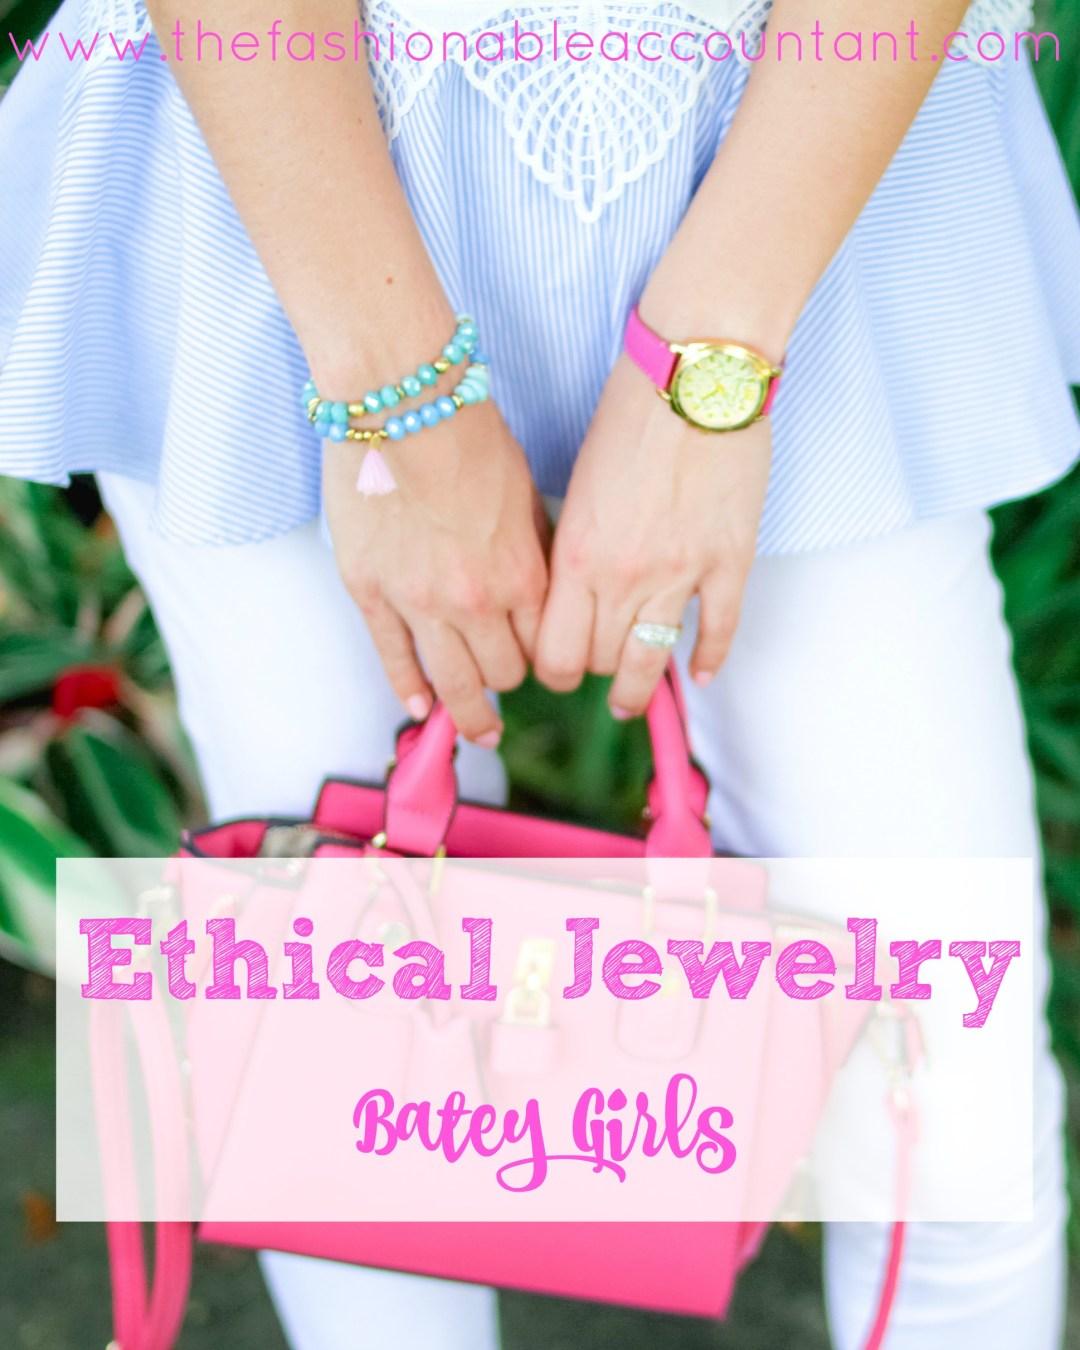 ETHICAL JEWELRY BATEY GIRLS